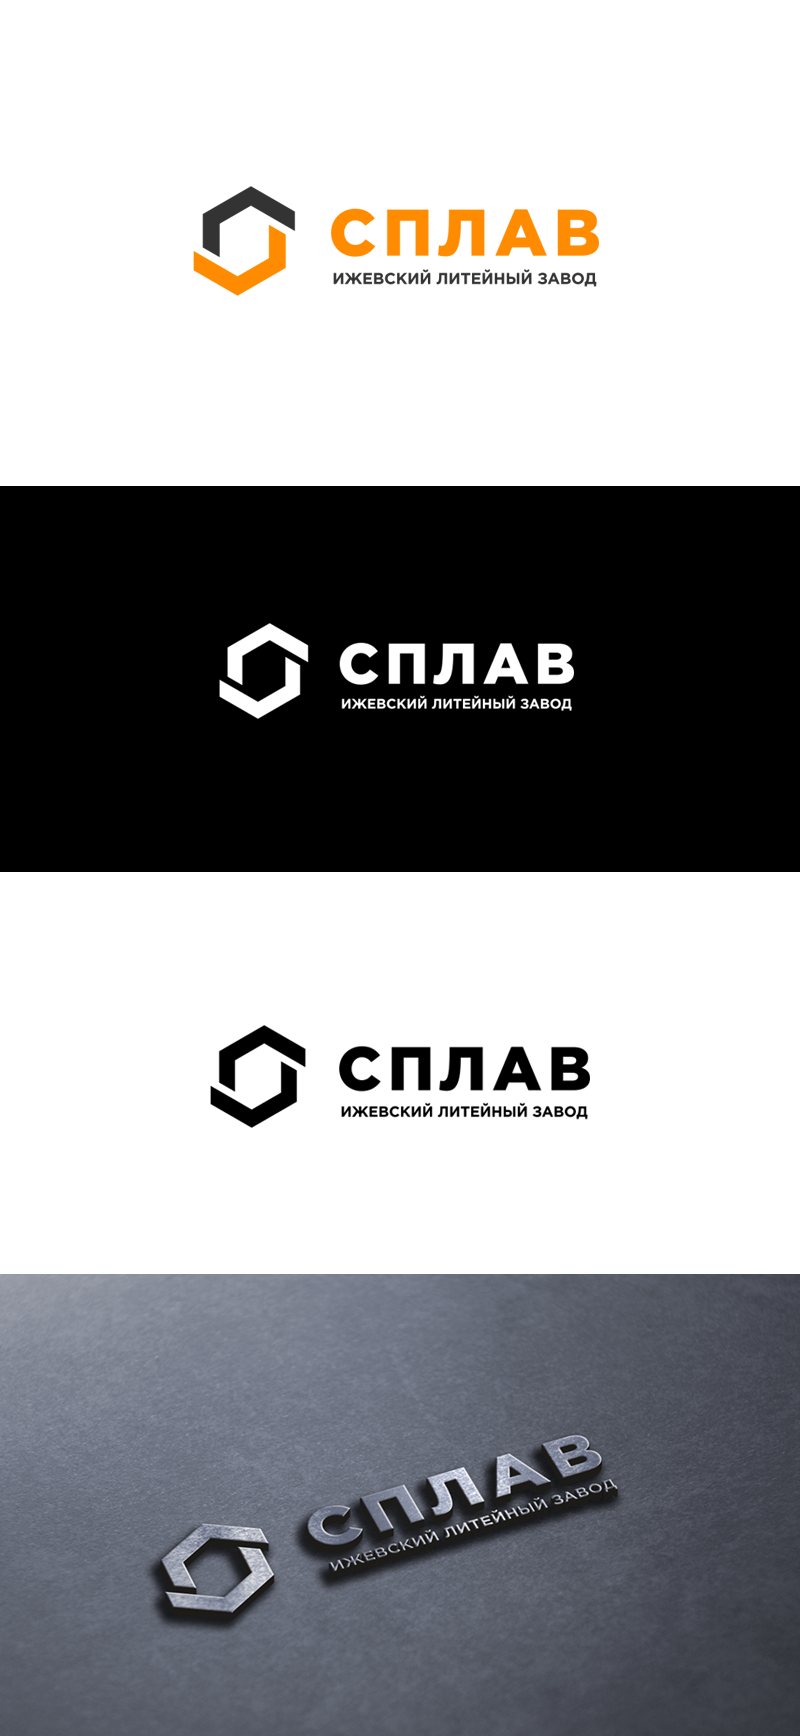 Разработать логотип для литейного завода фото f_8815b006378a8c47.png